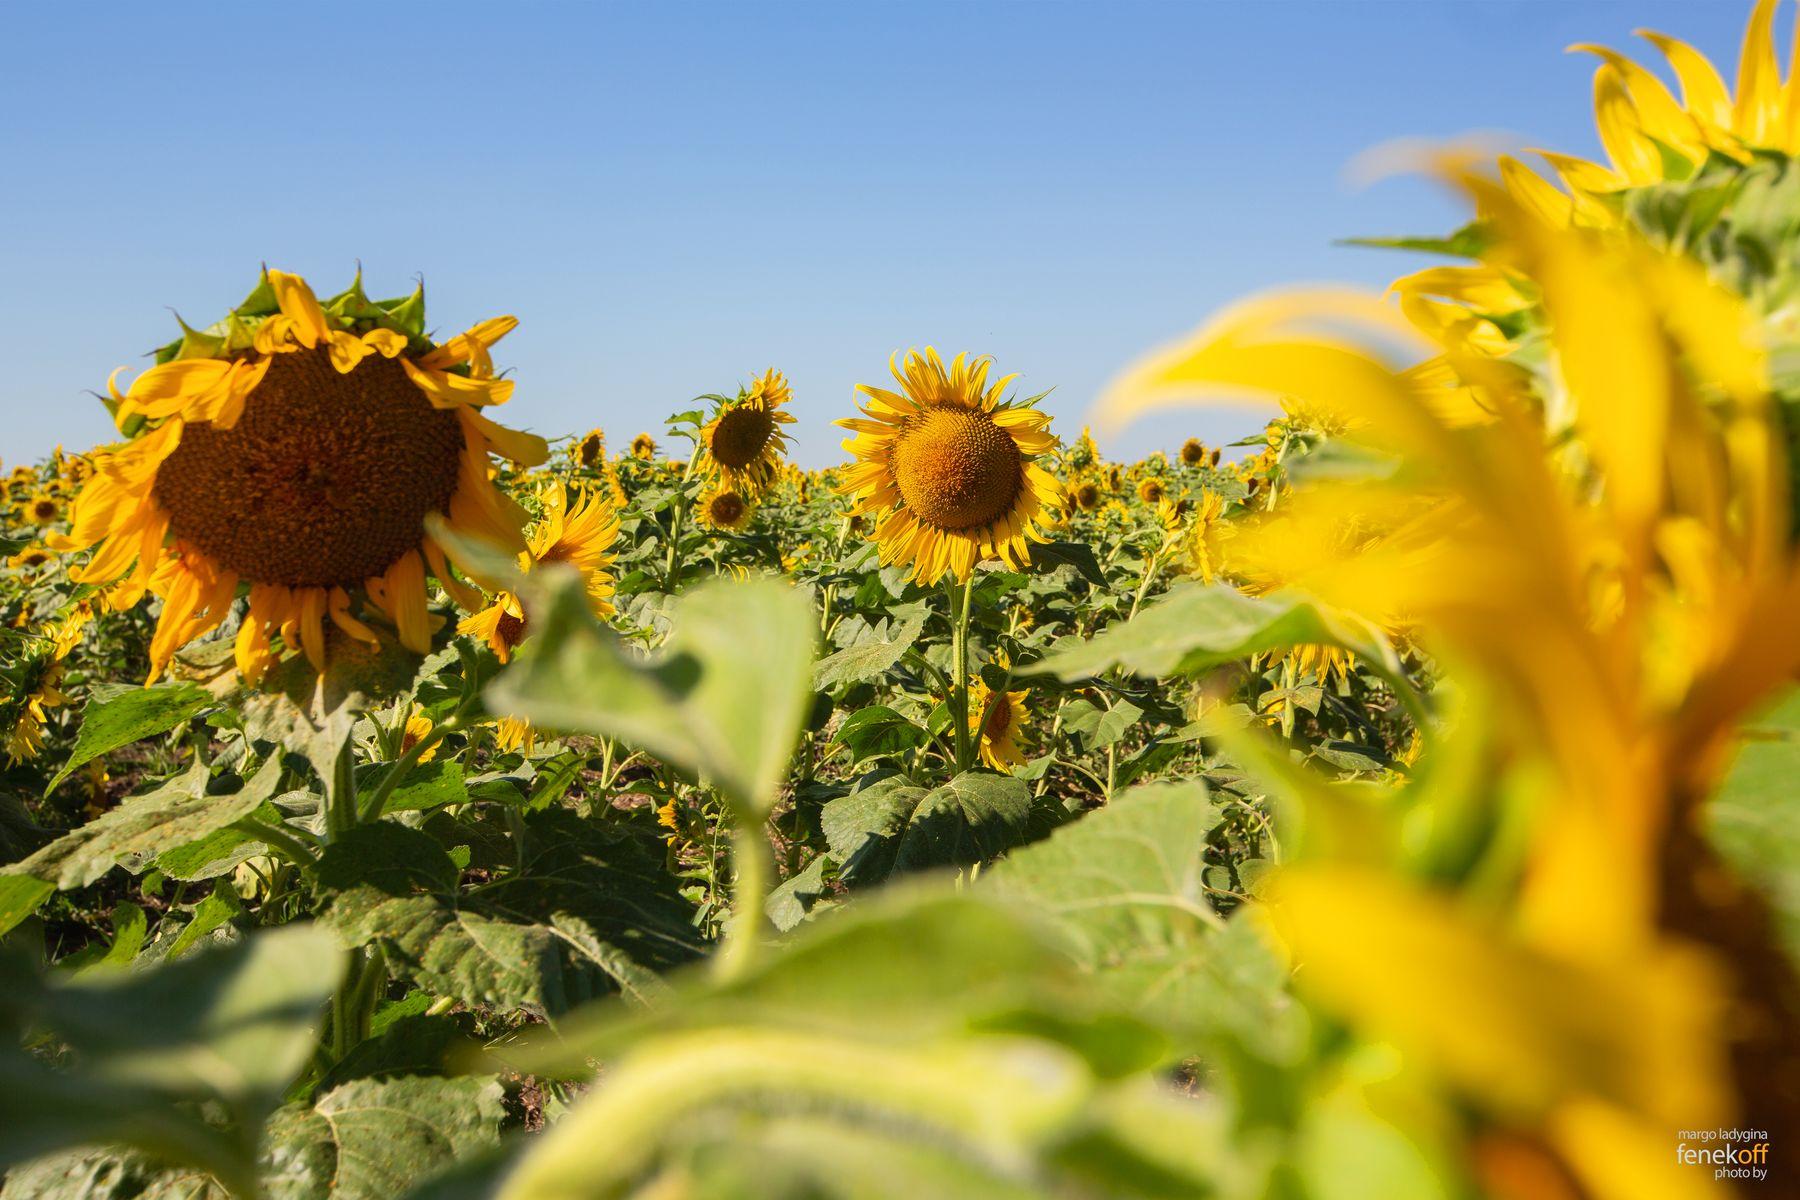 Подсолнухи подсолнухи цветы семечки путешествие природа flowers sunflowers nature travel